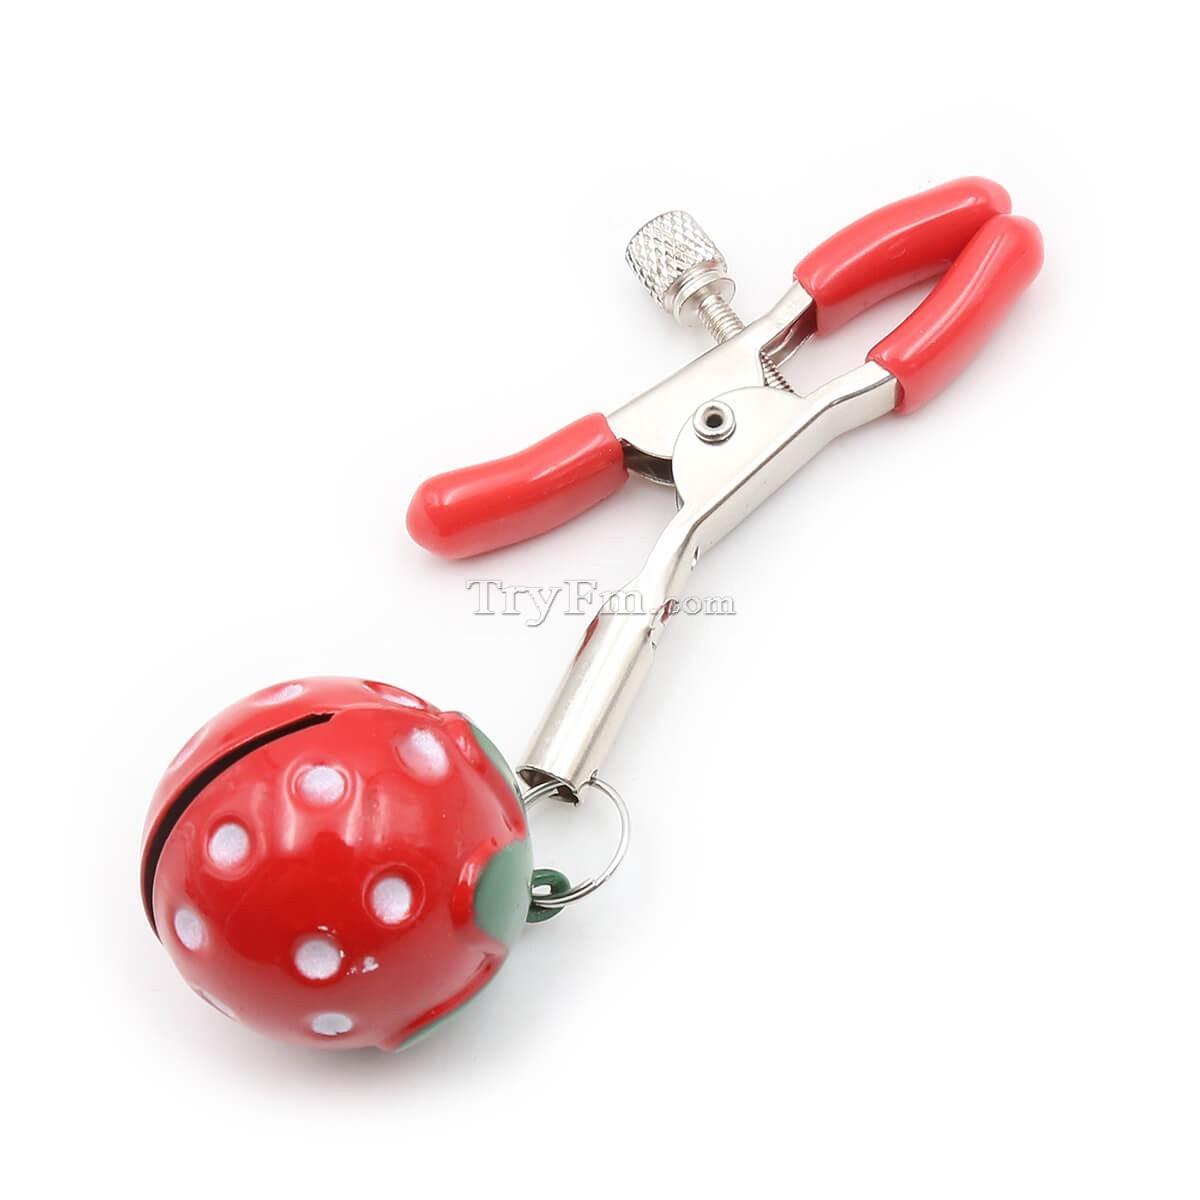 1-red-cherry-nipple-clamp2.jpg